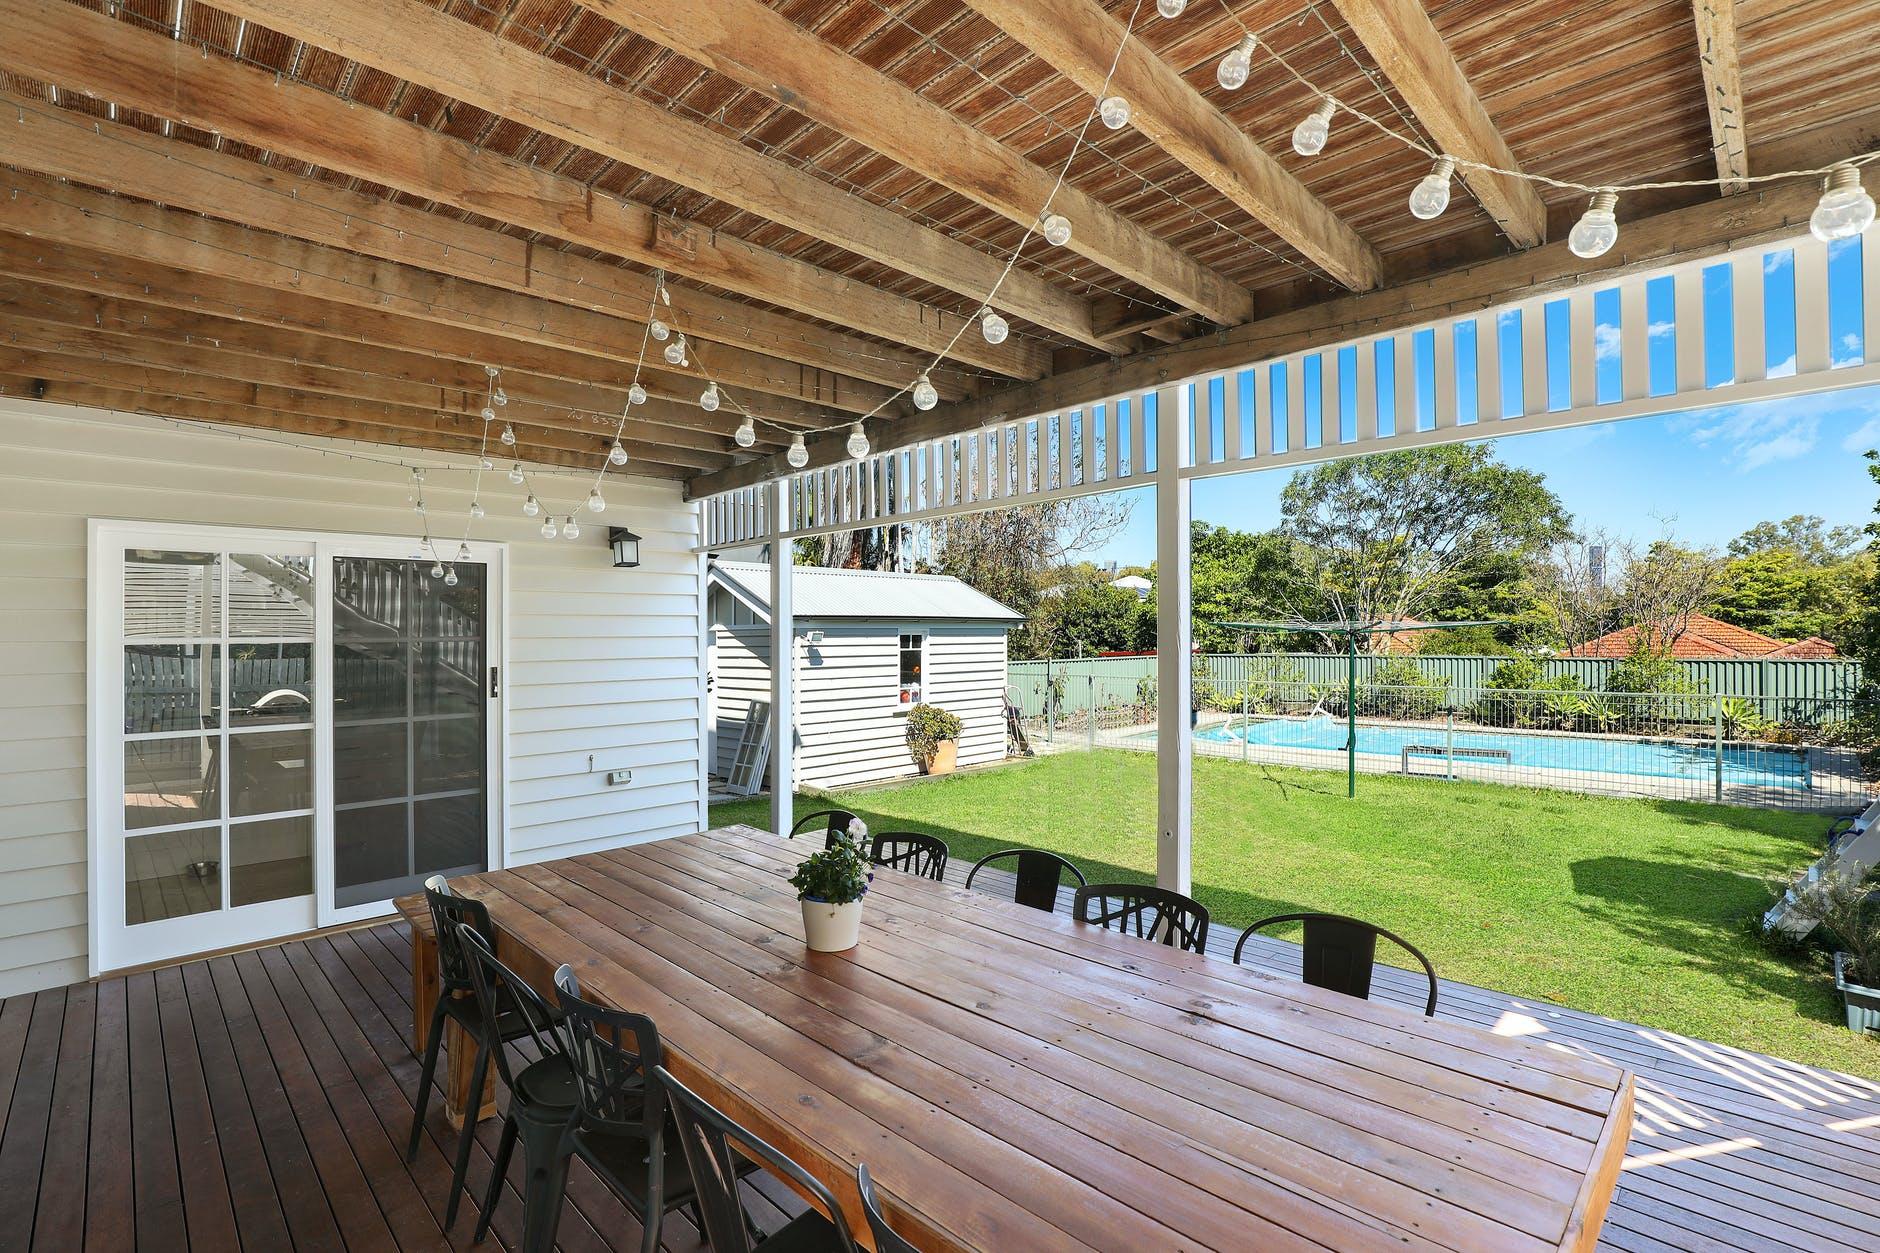 outdoor artificial grass putting green patio